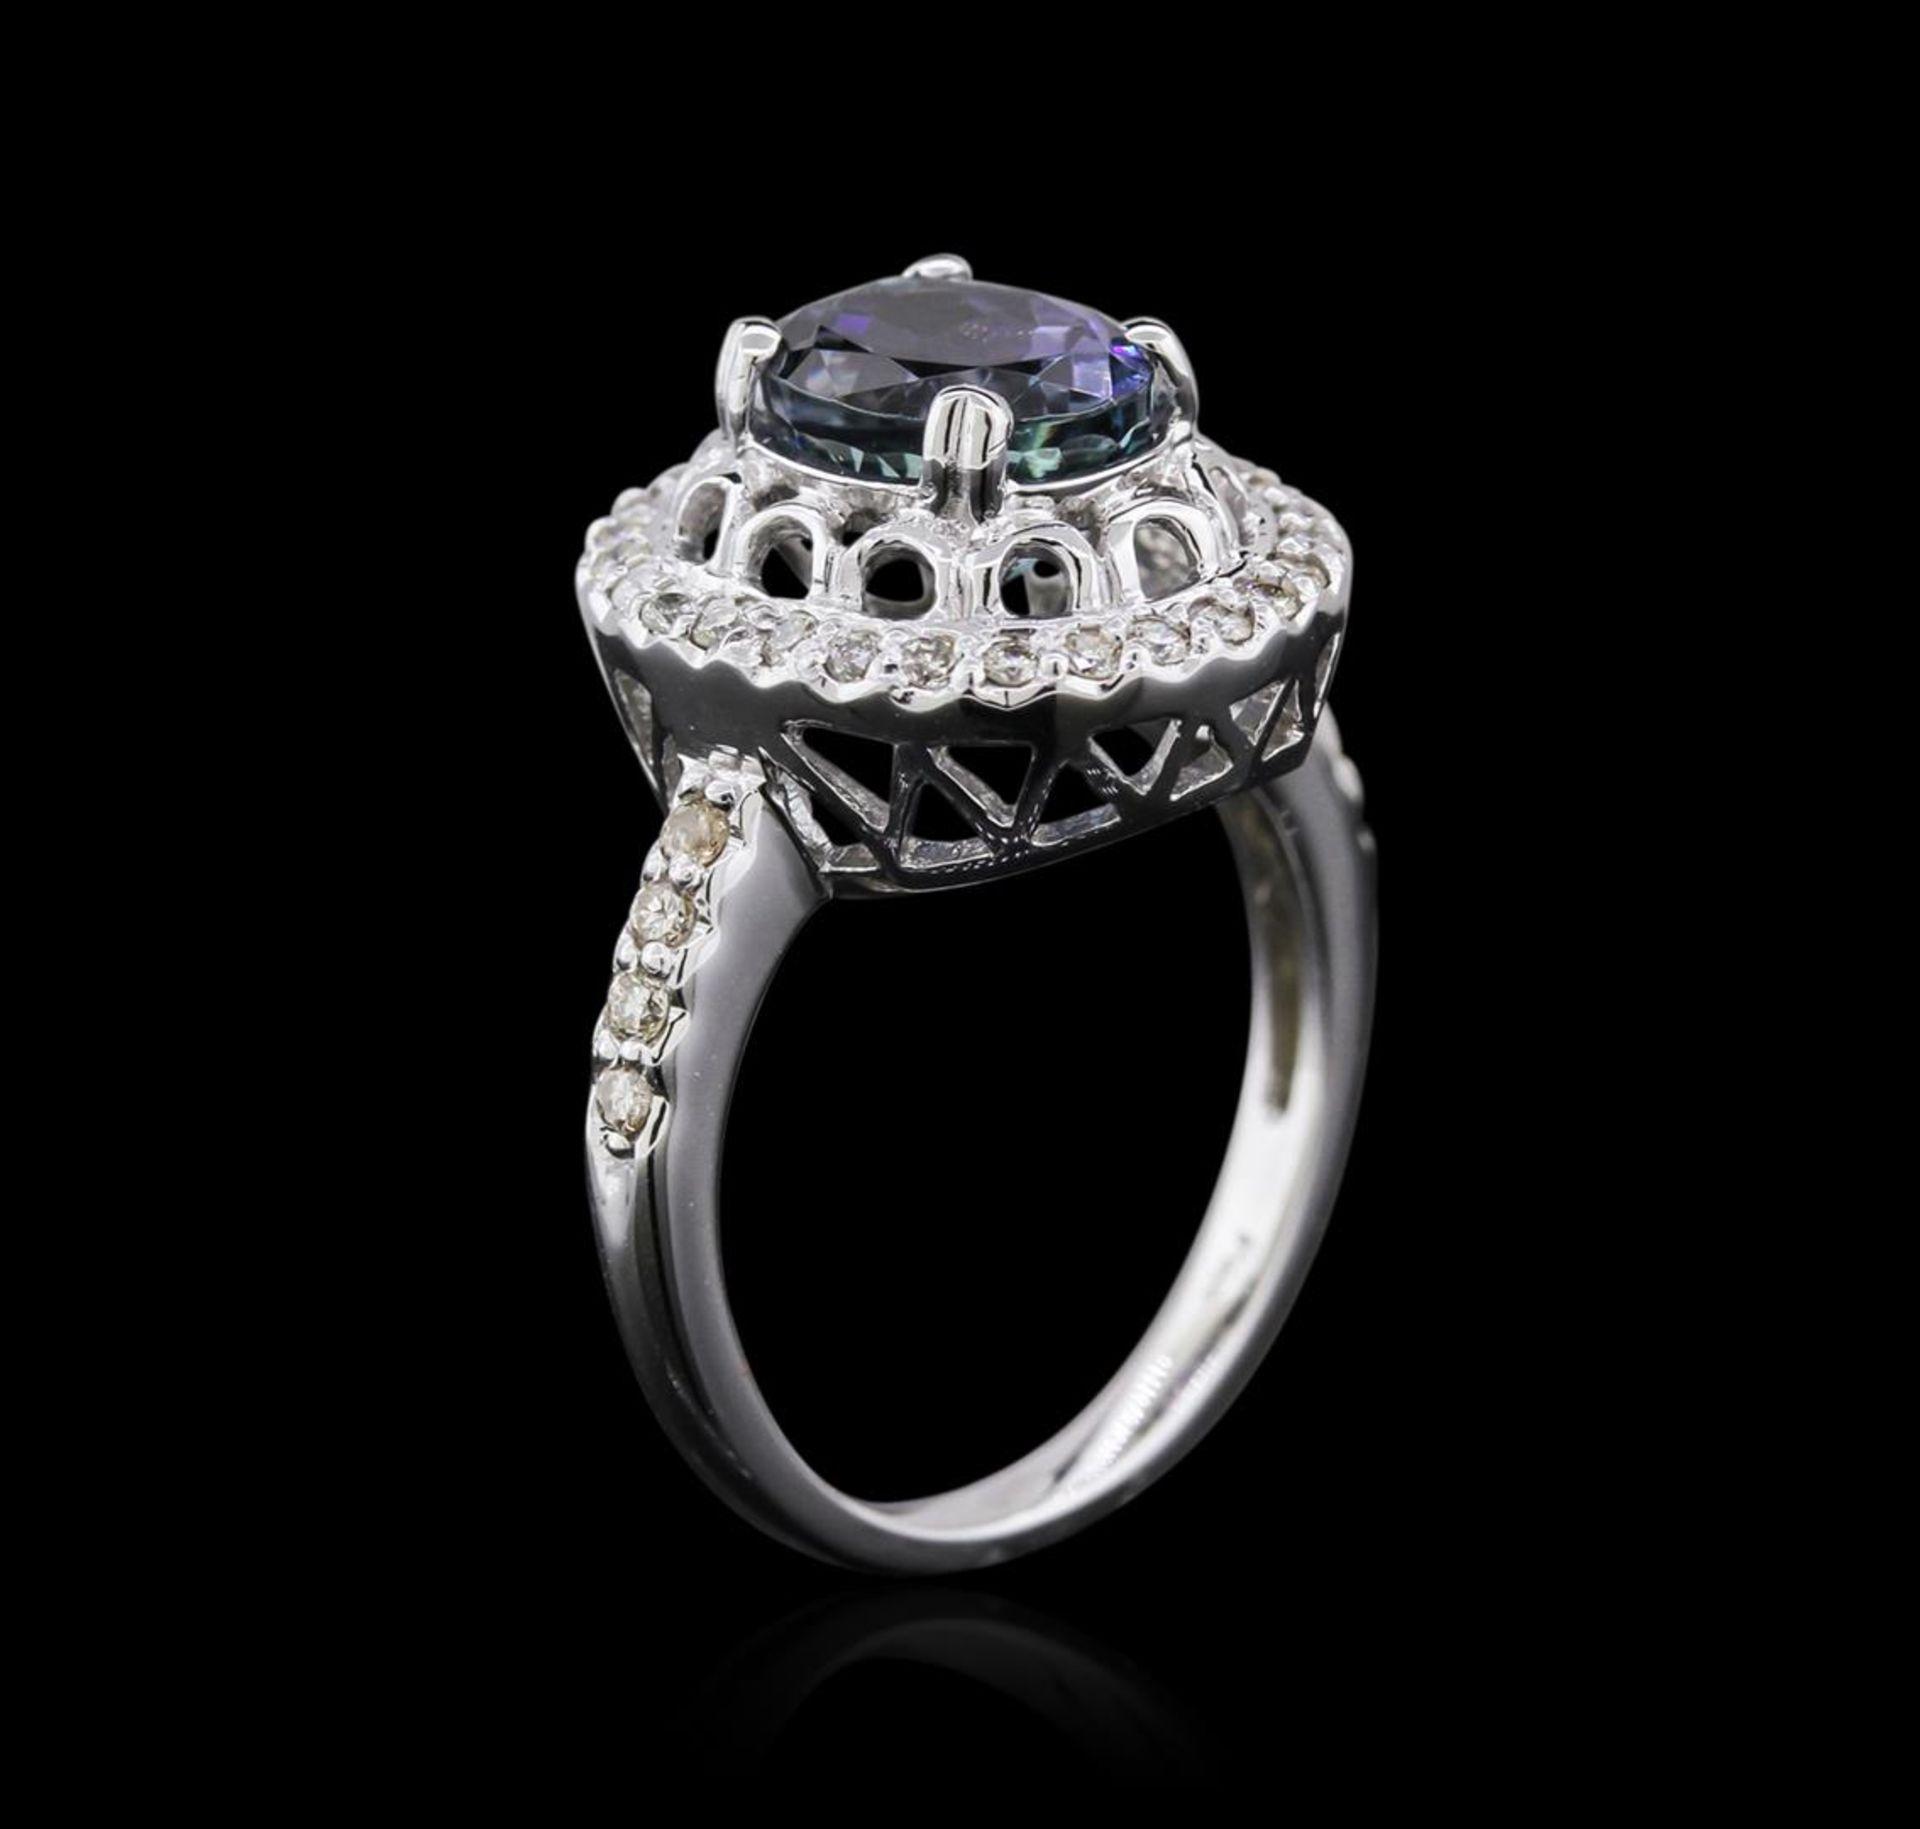 14KT White Gold 2.56 ctw Tanzanite and Diamond Ring - Image 3 of 4